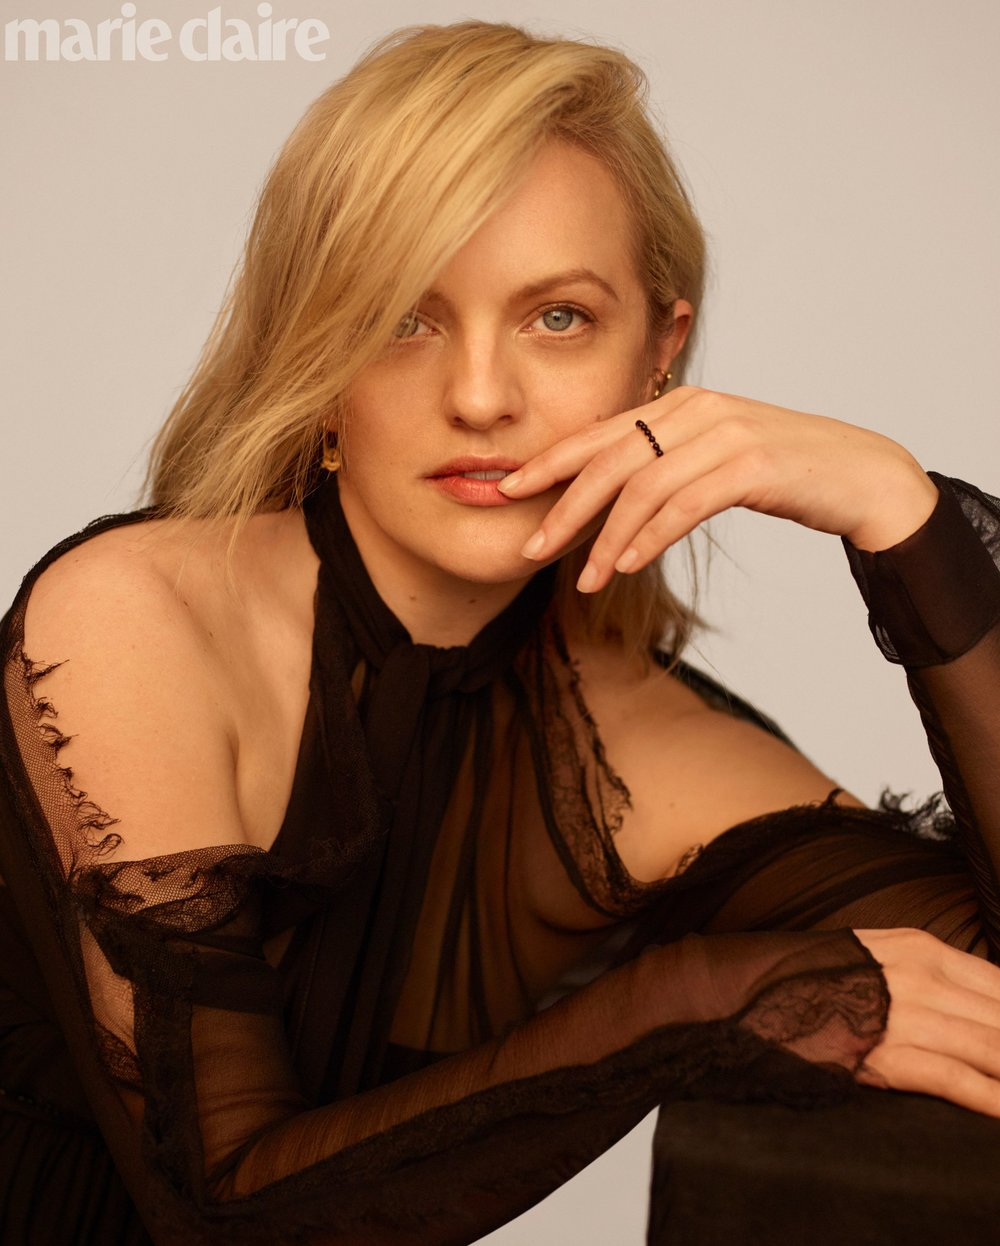 Marie Claire May 2019 Diamond Amelie Ear Cuff 2.jpg